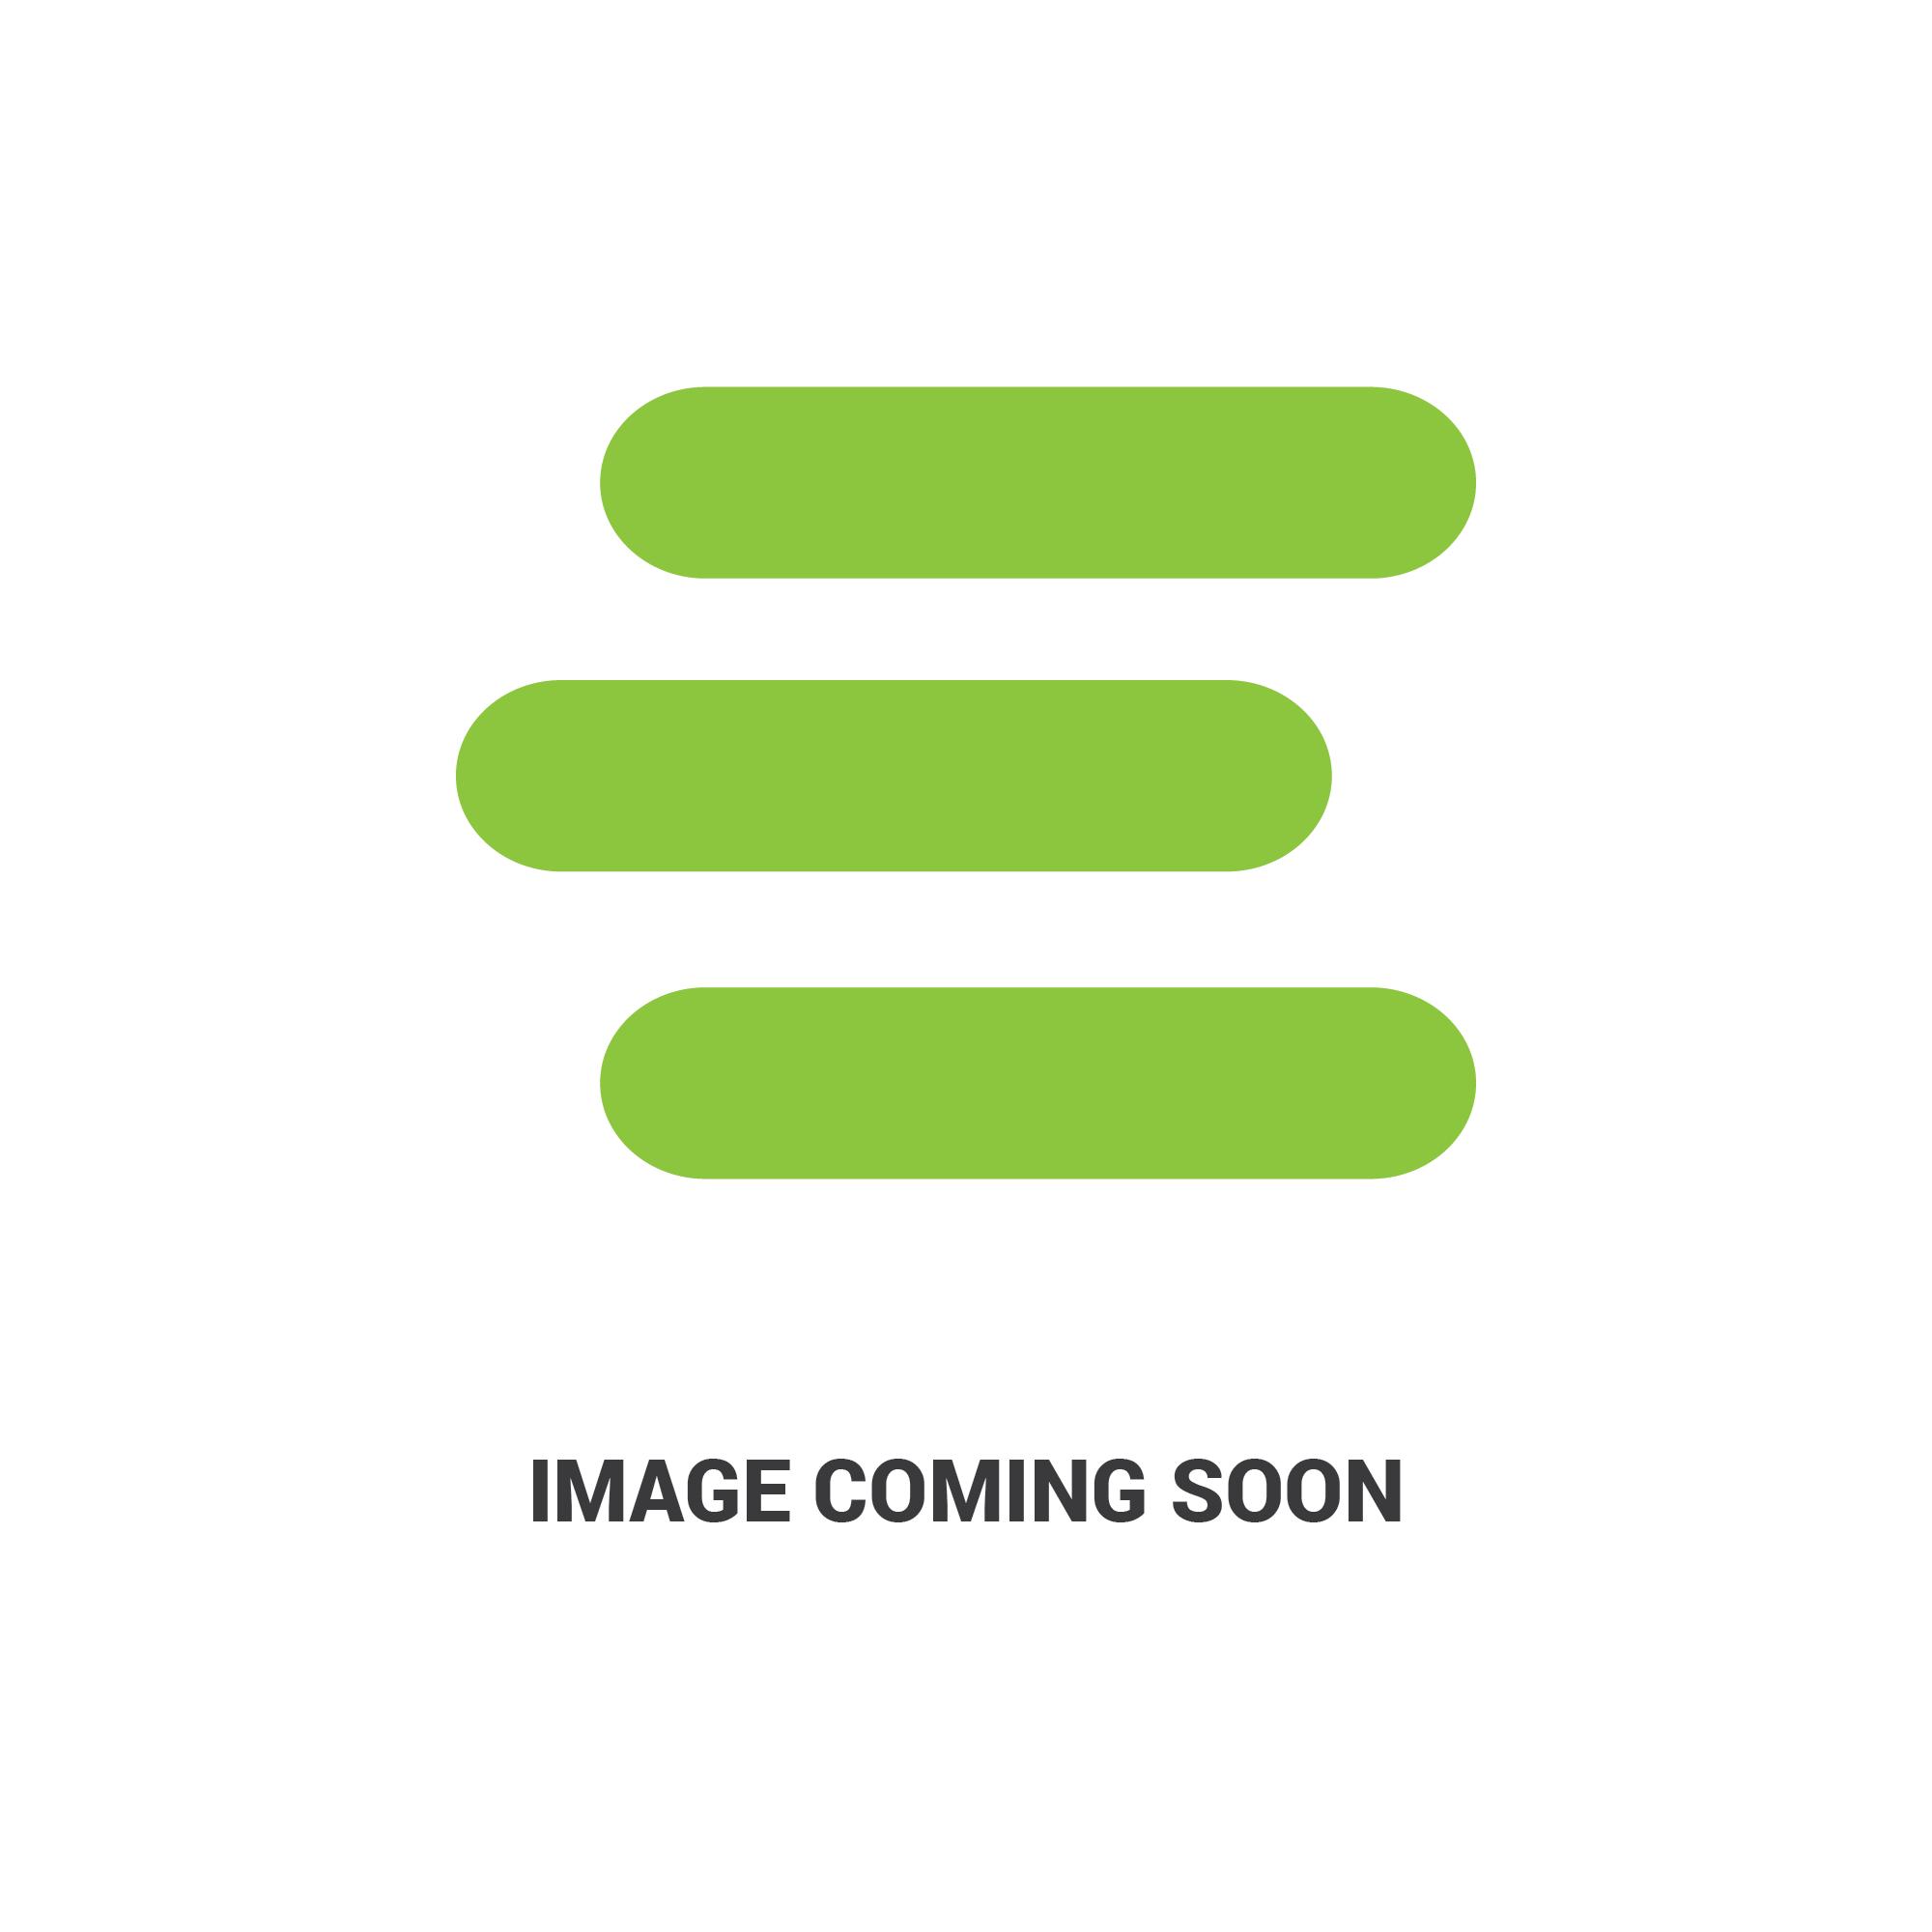 E-697552edit 1.jpg